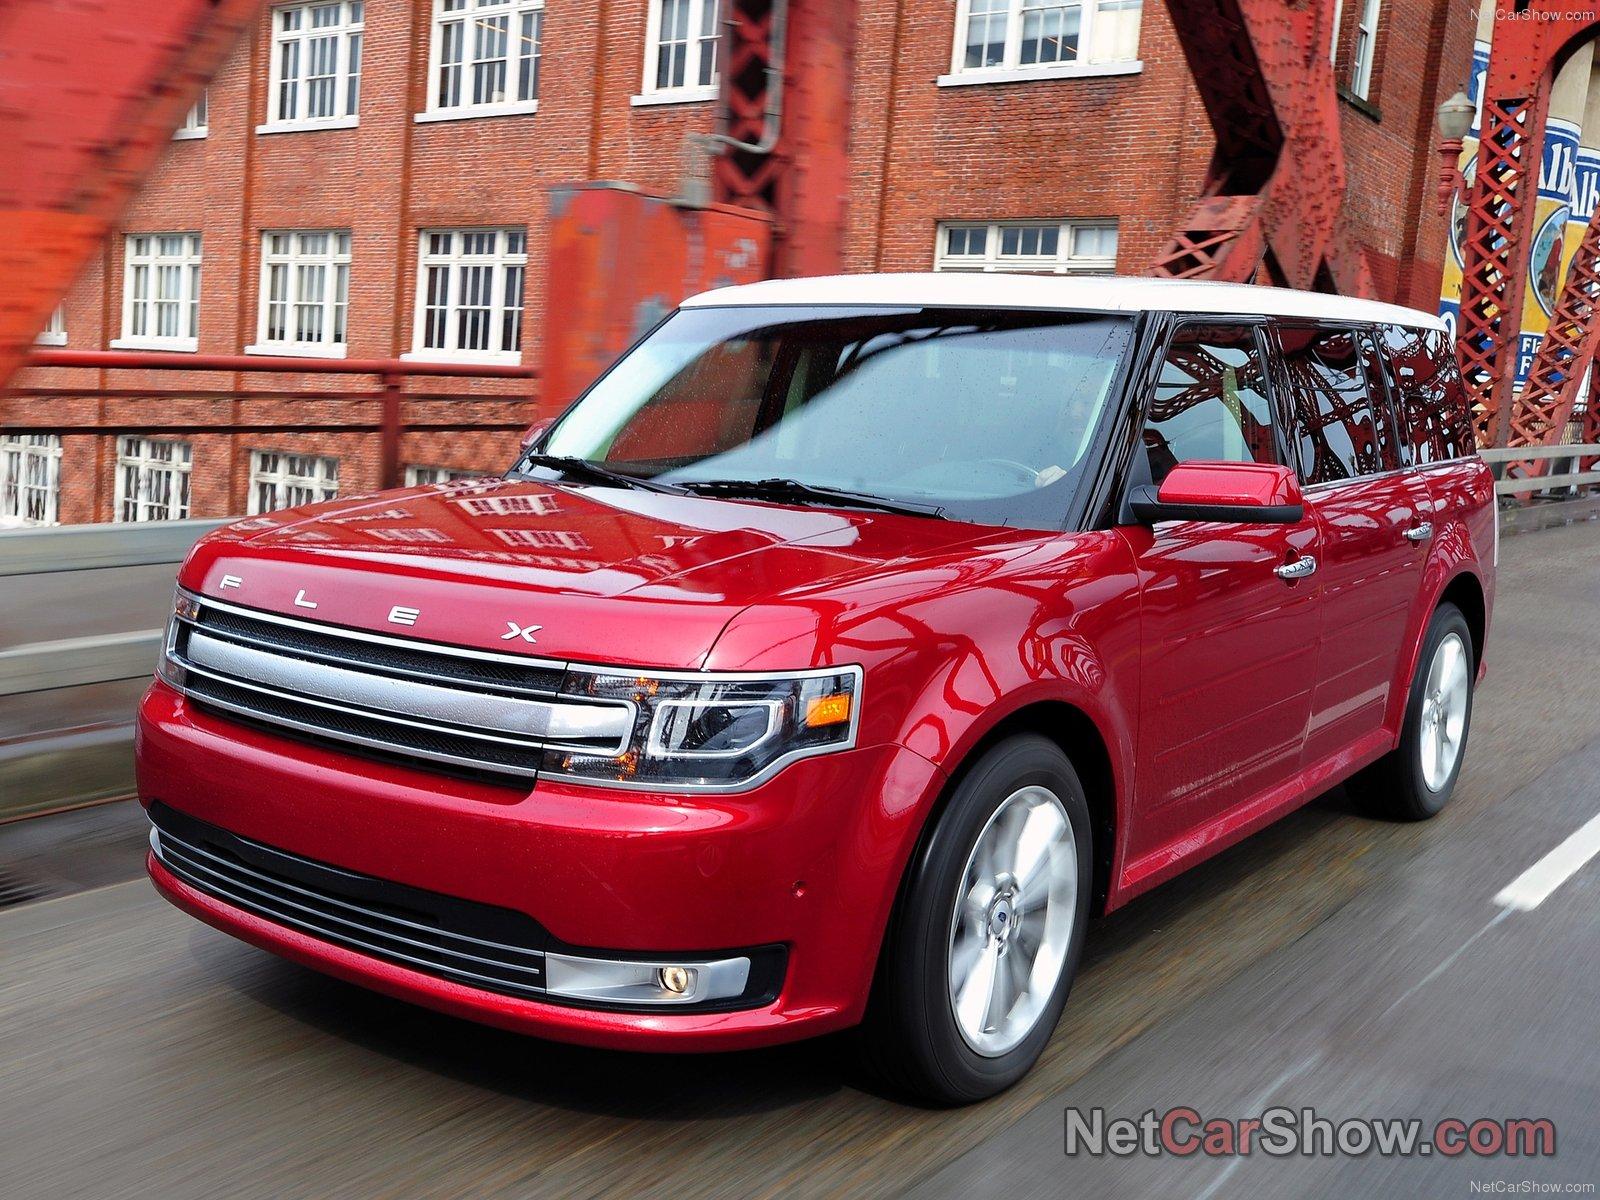 Ford Transit (Форд Транзит) - Продажа, Цены, Отзывы, Фото ...